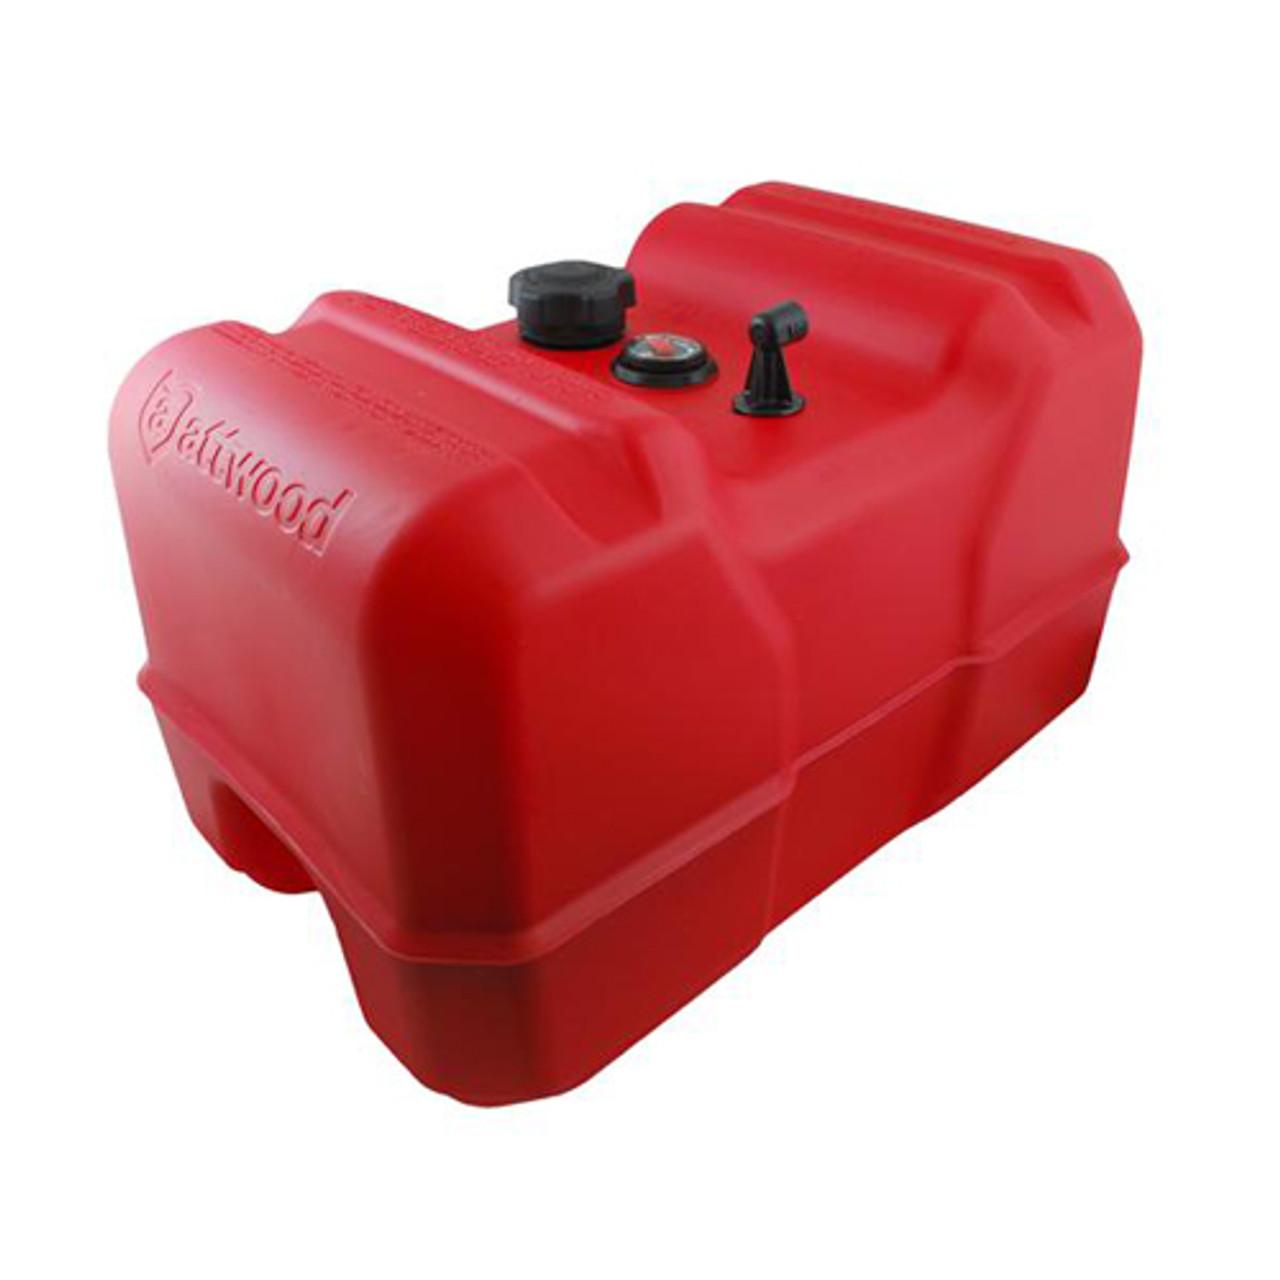 Portable Fuel Tank 3 Gallon Without Gauge 16.6 x 11.45 x 7.3 Attwood 8803LP2